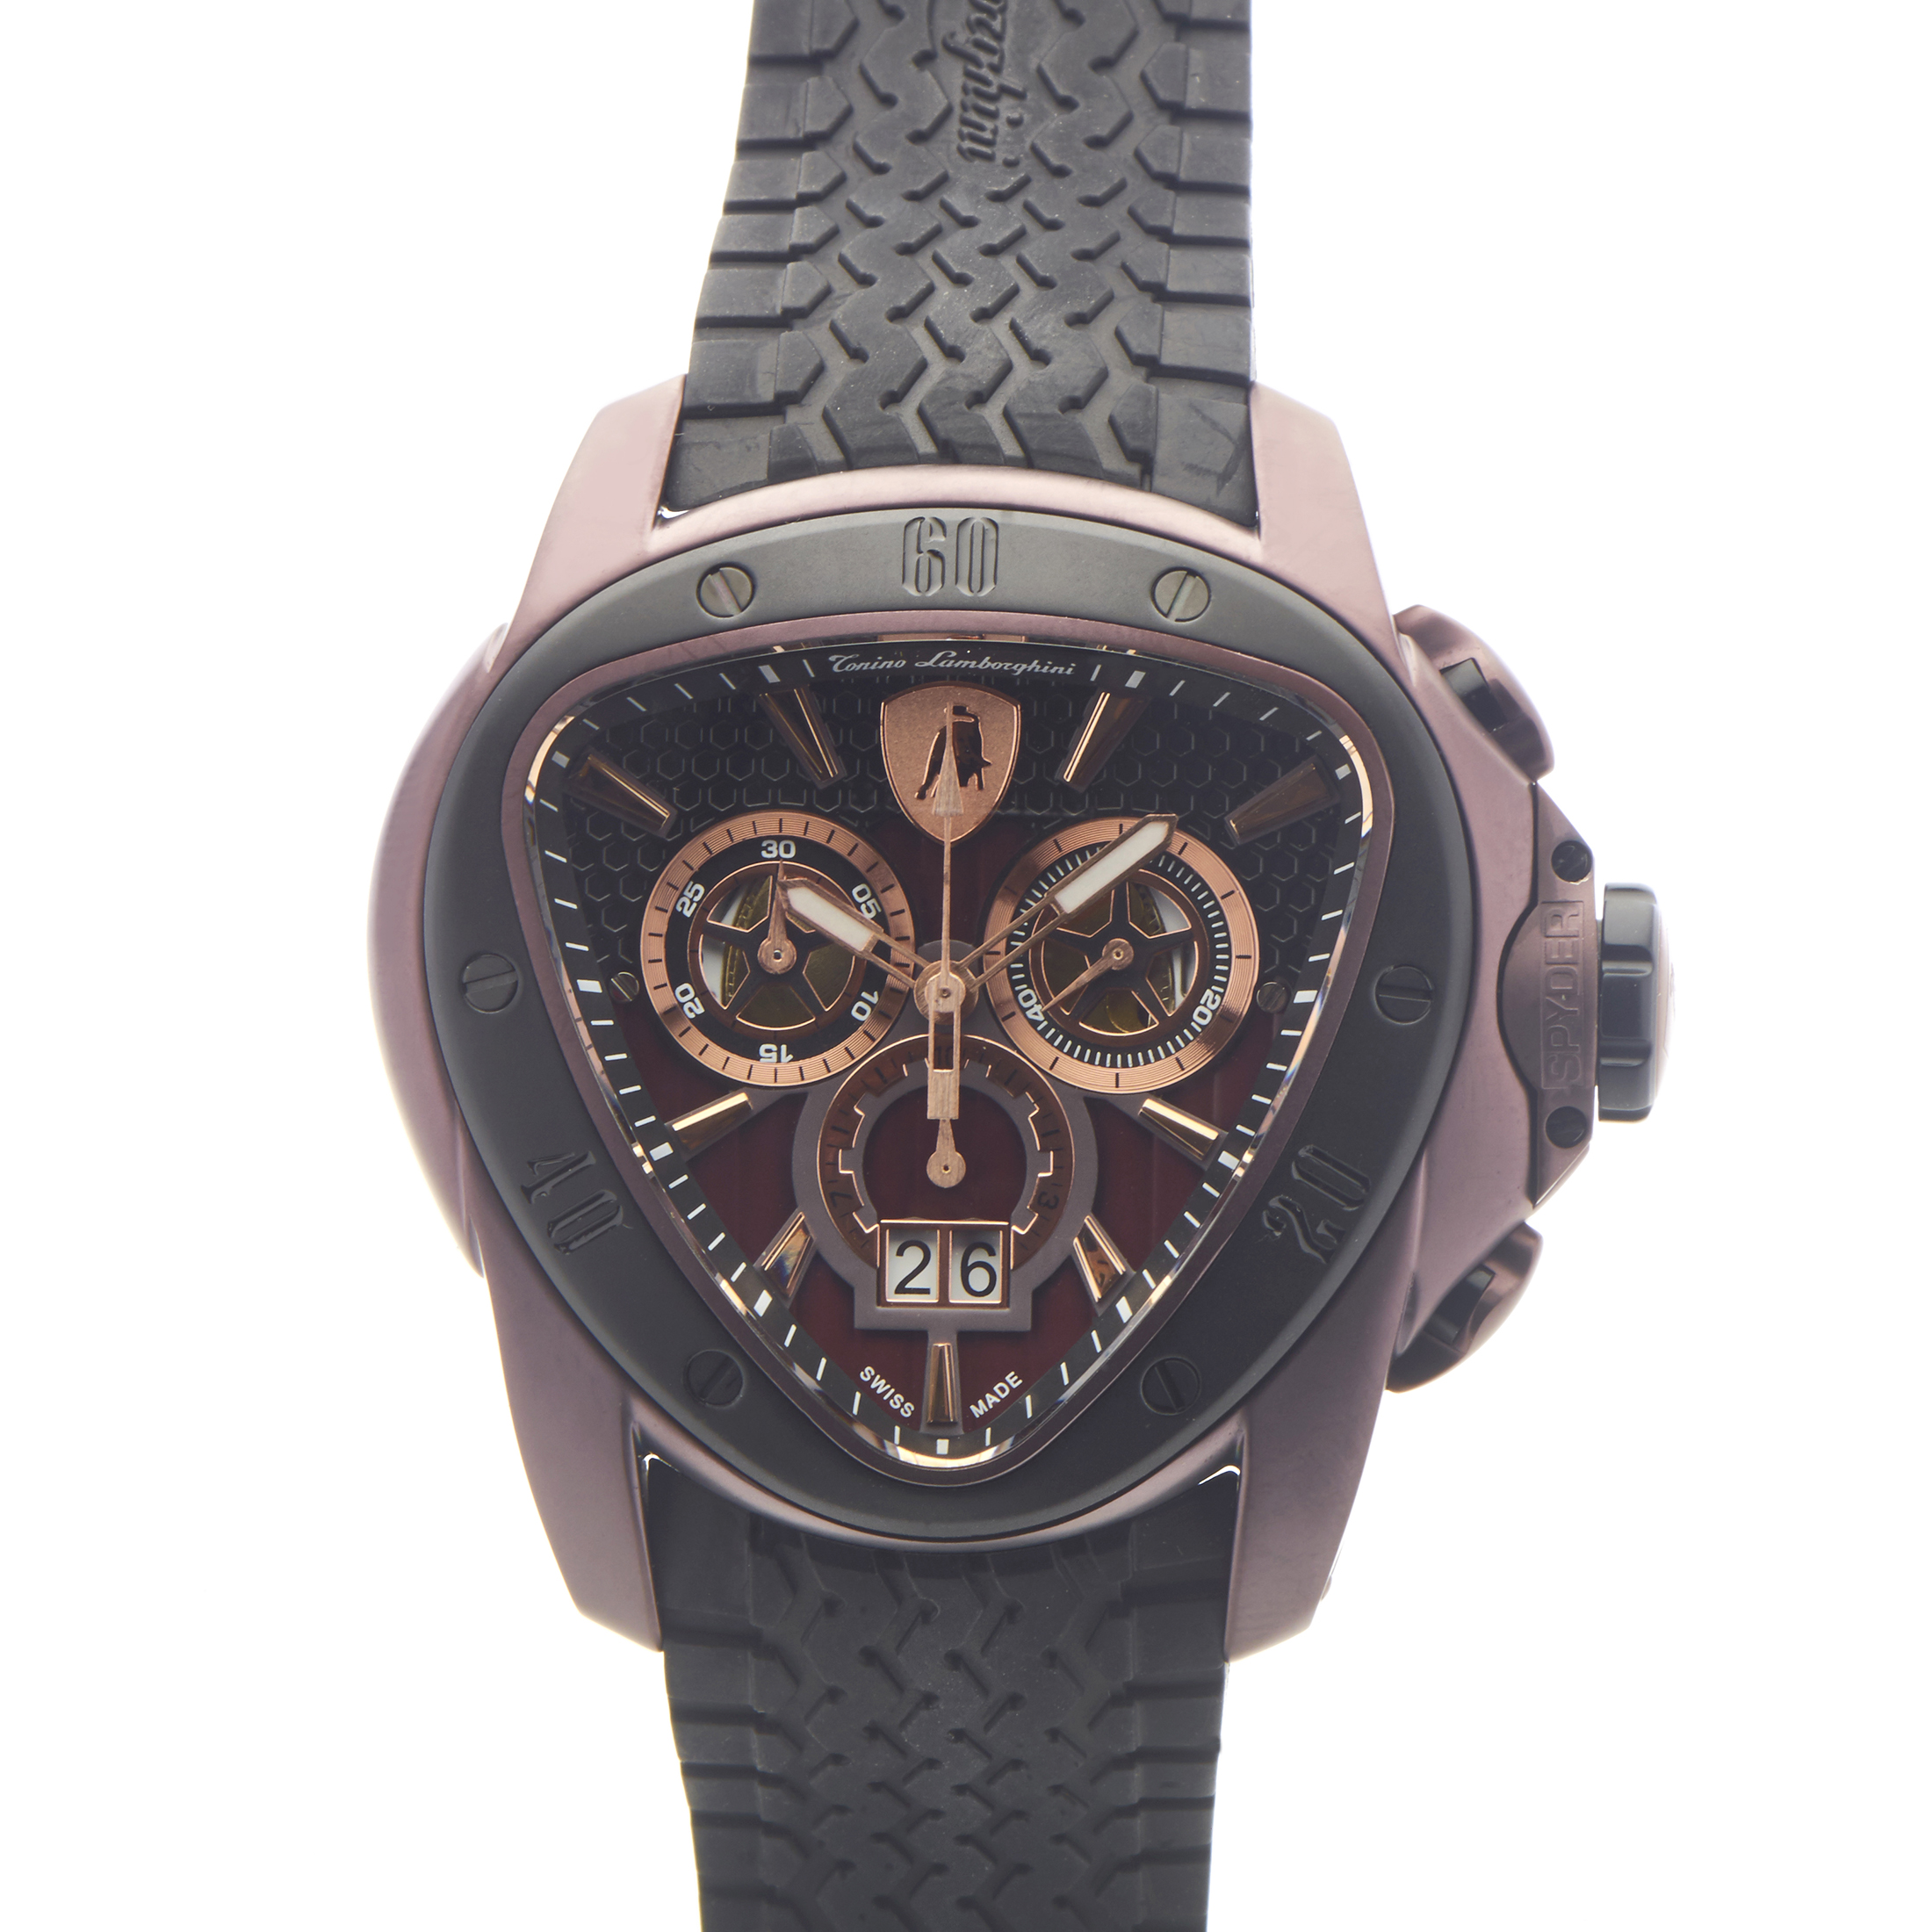 Spyder Men's Quartz Chronograph Watch 1100 1122